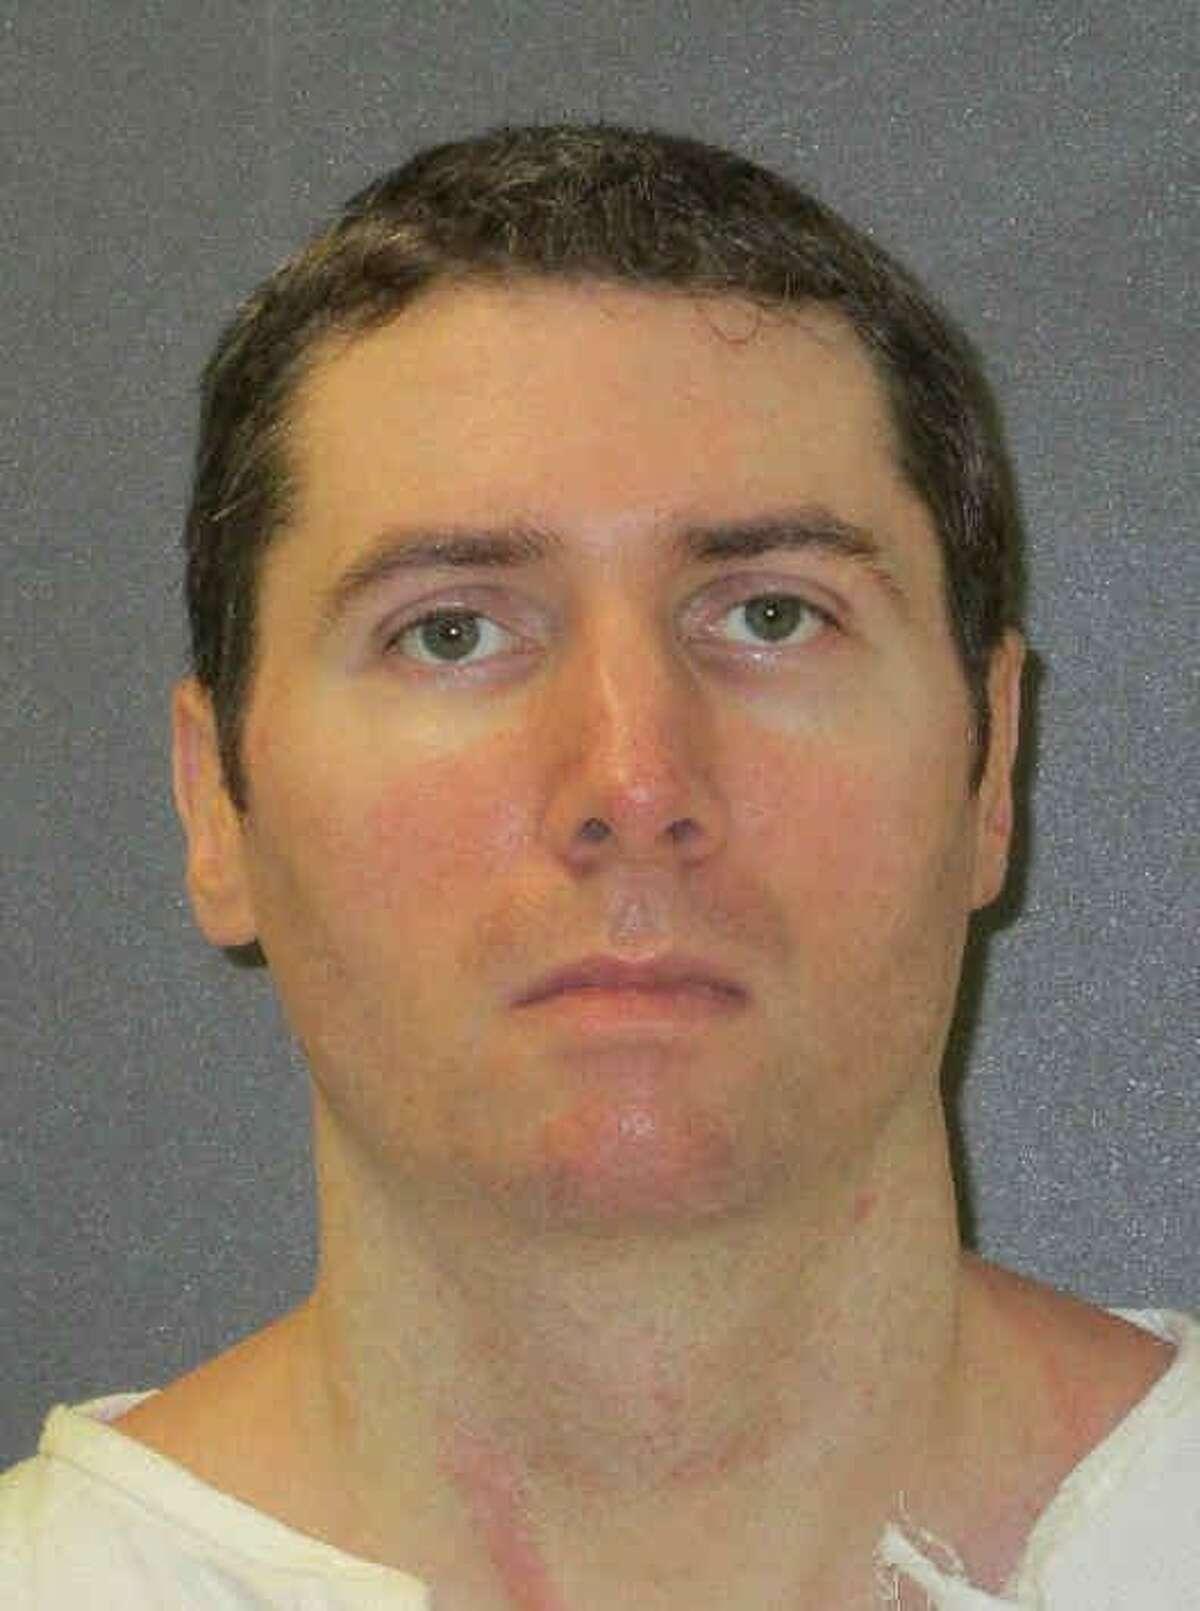 Justen Hall is a death row prisoner.